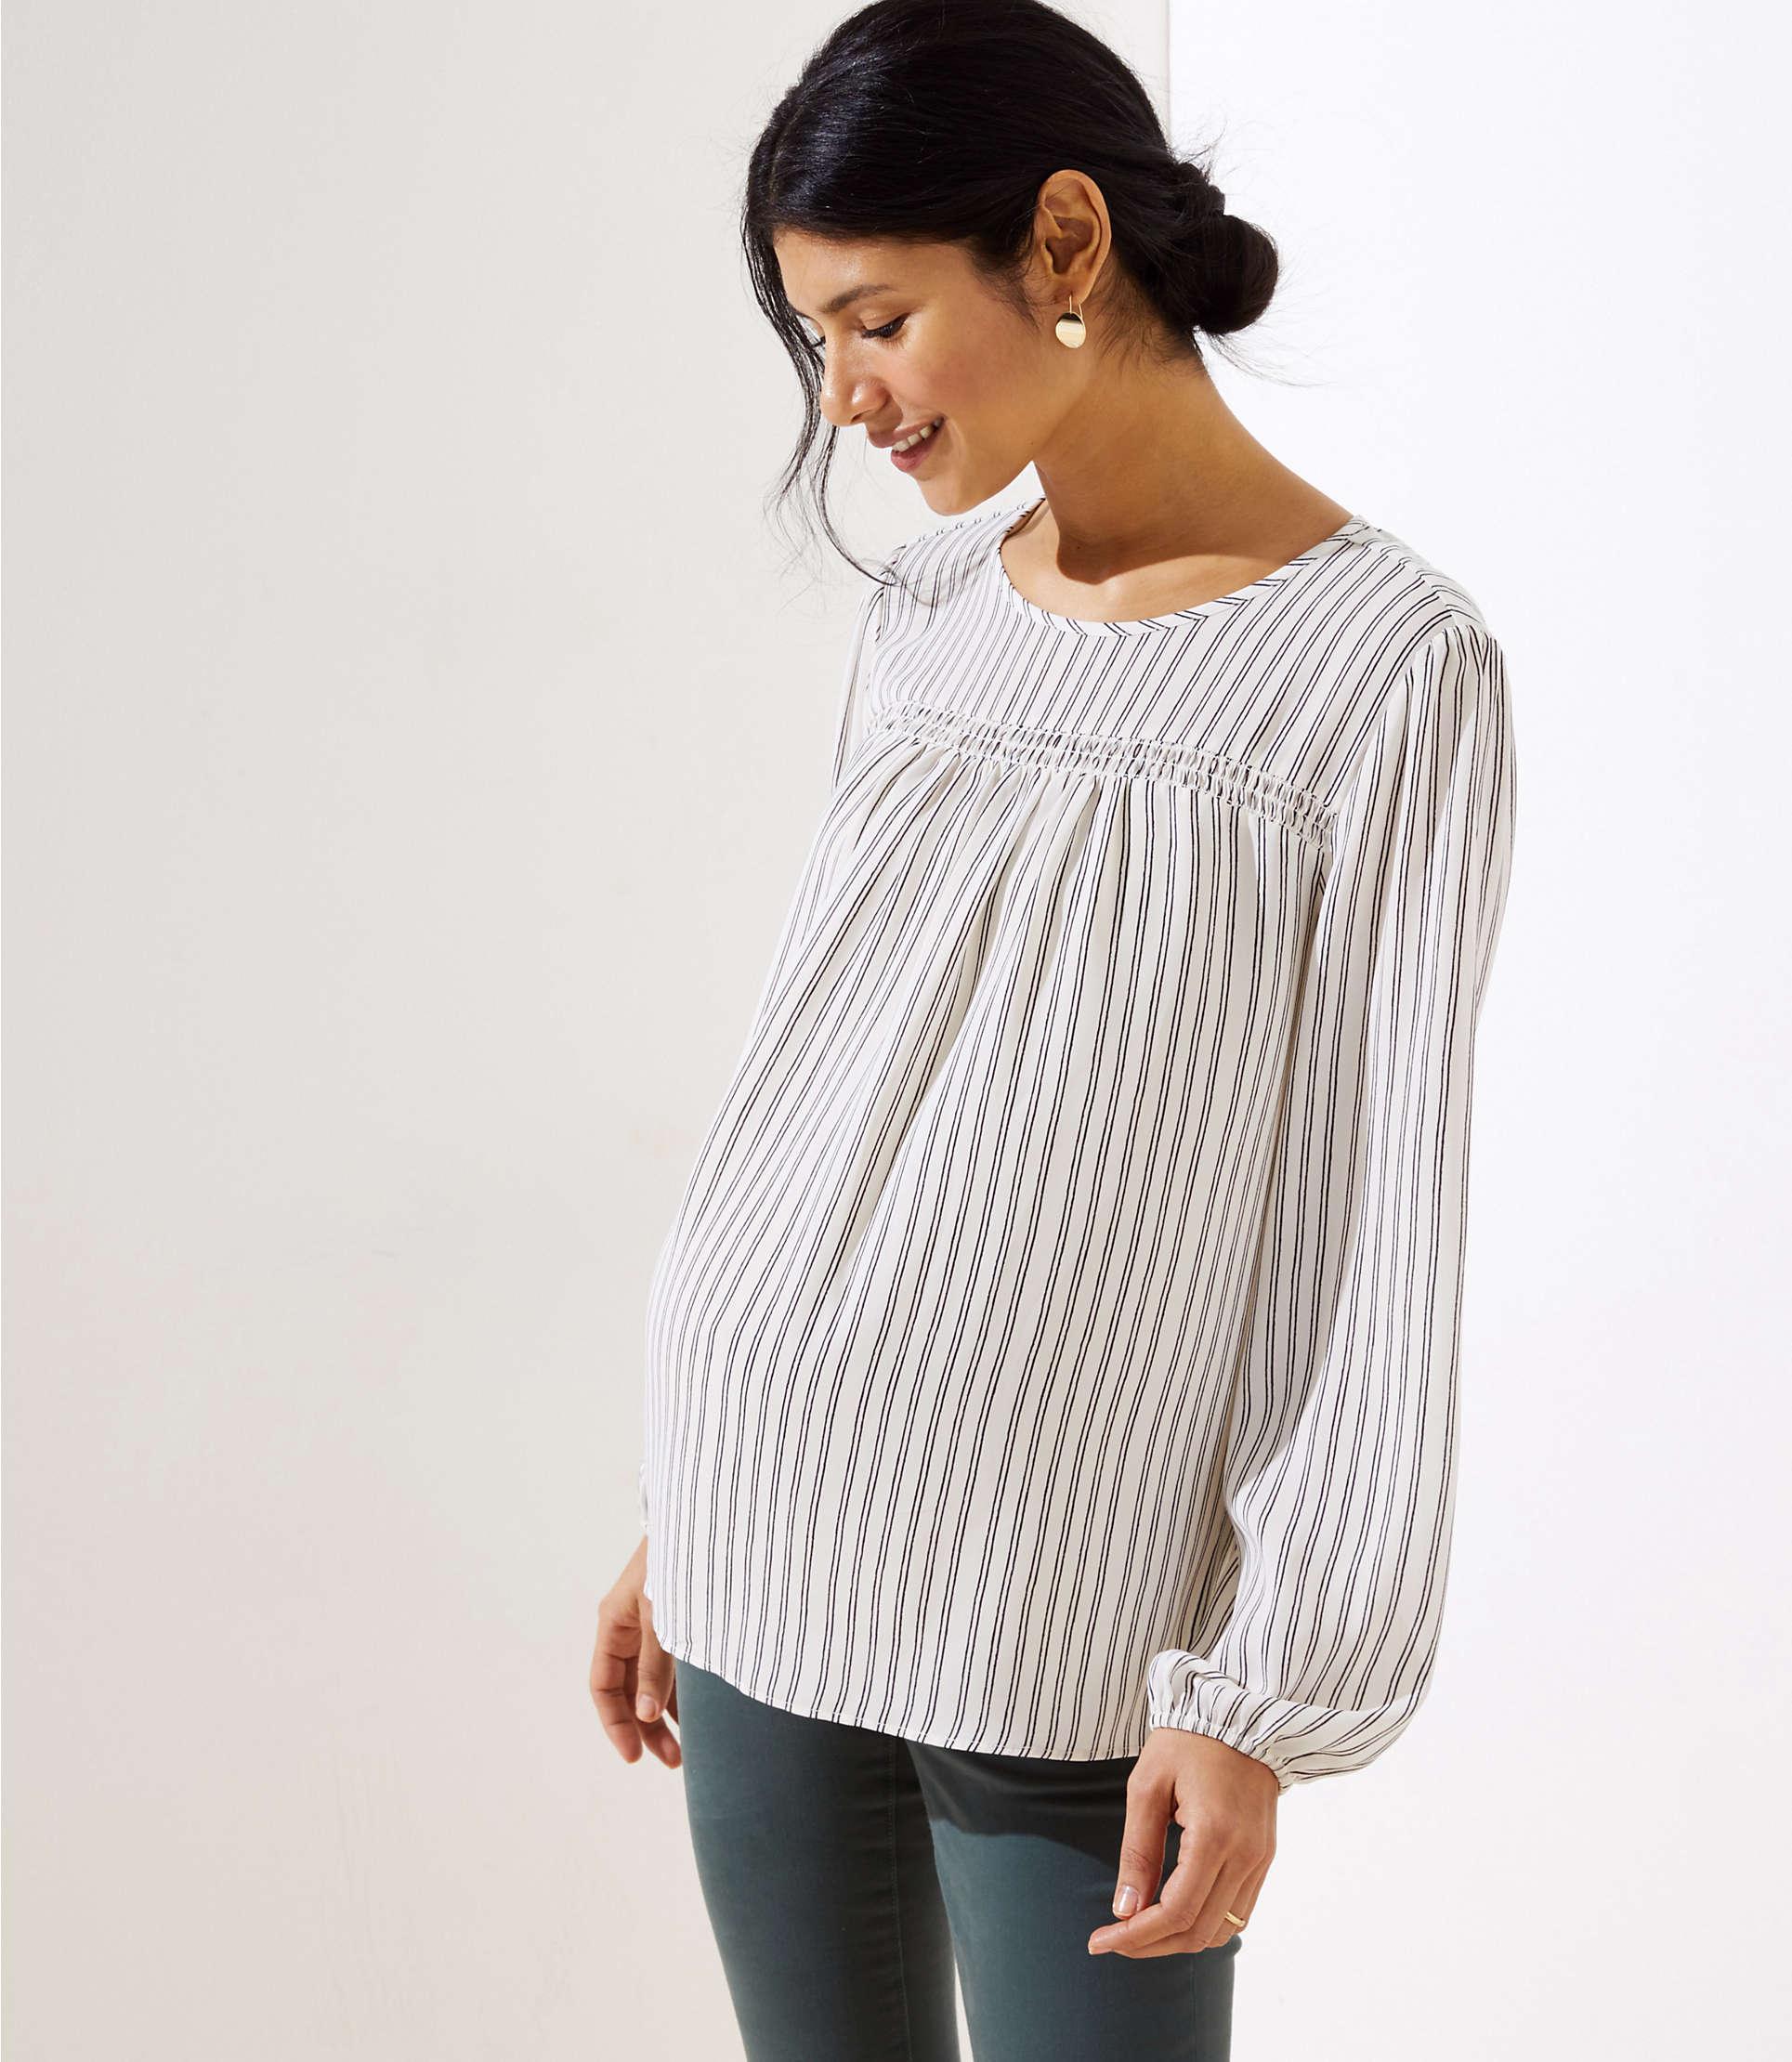 c8f38f4ebb84b7 Lyst - LOFT Maternity Striped Smocked Mixed Media Blouse in Black